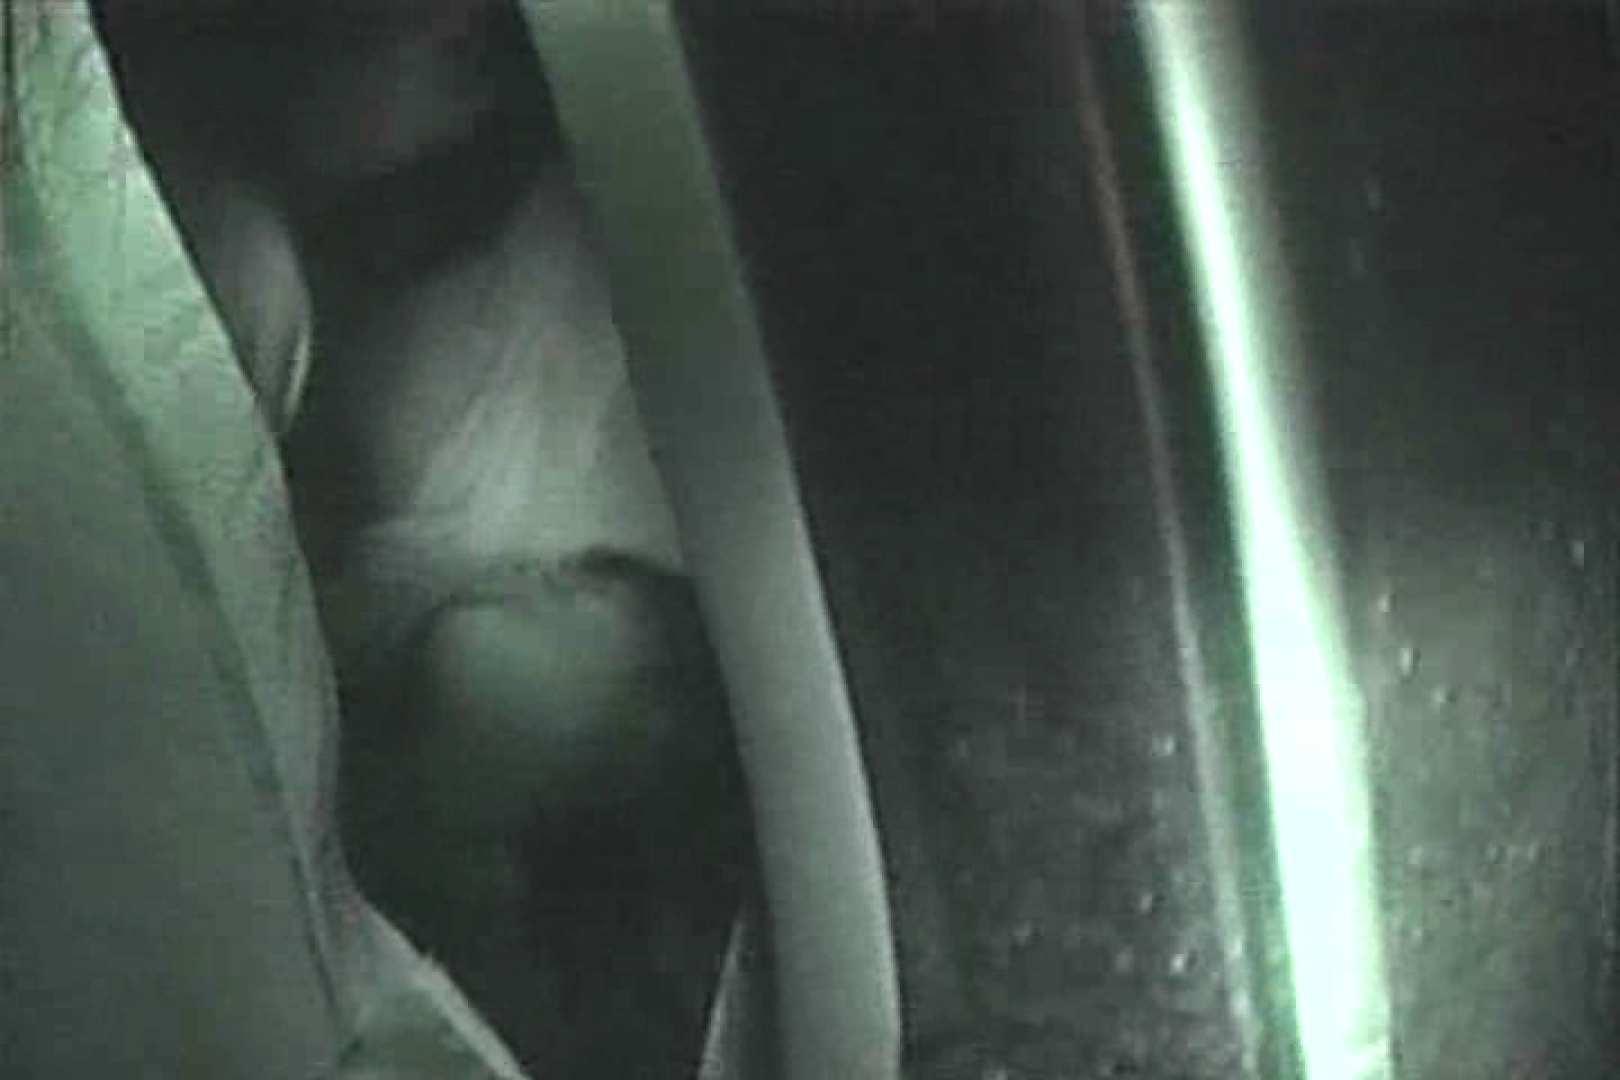 MASAさんの待ち伏せ撮り! 赤外線カーセックスVol.12 肛門特集 オメコ無修正動画無料 80pic 33